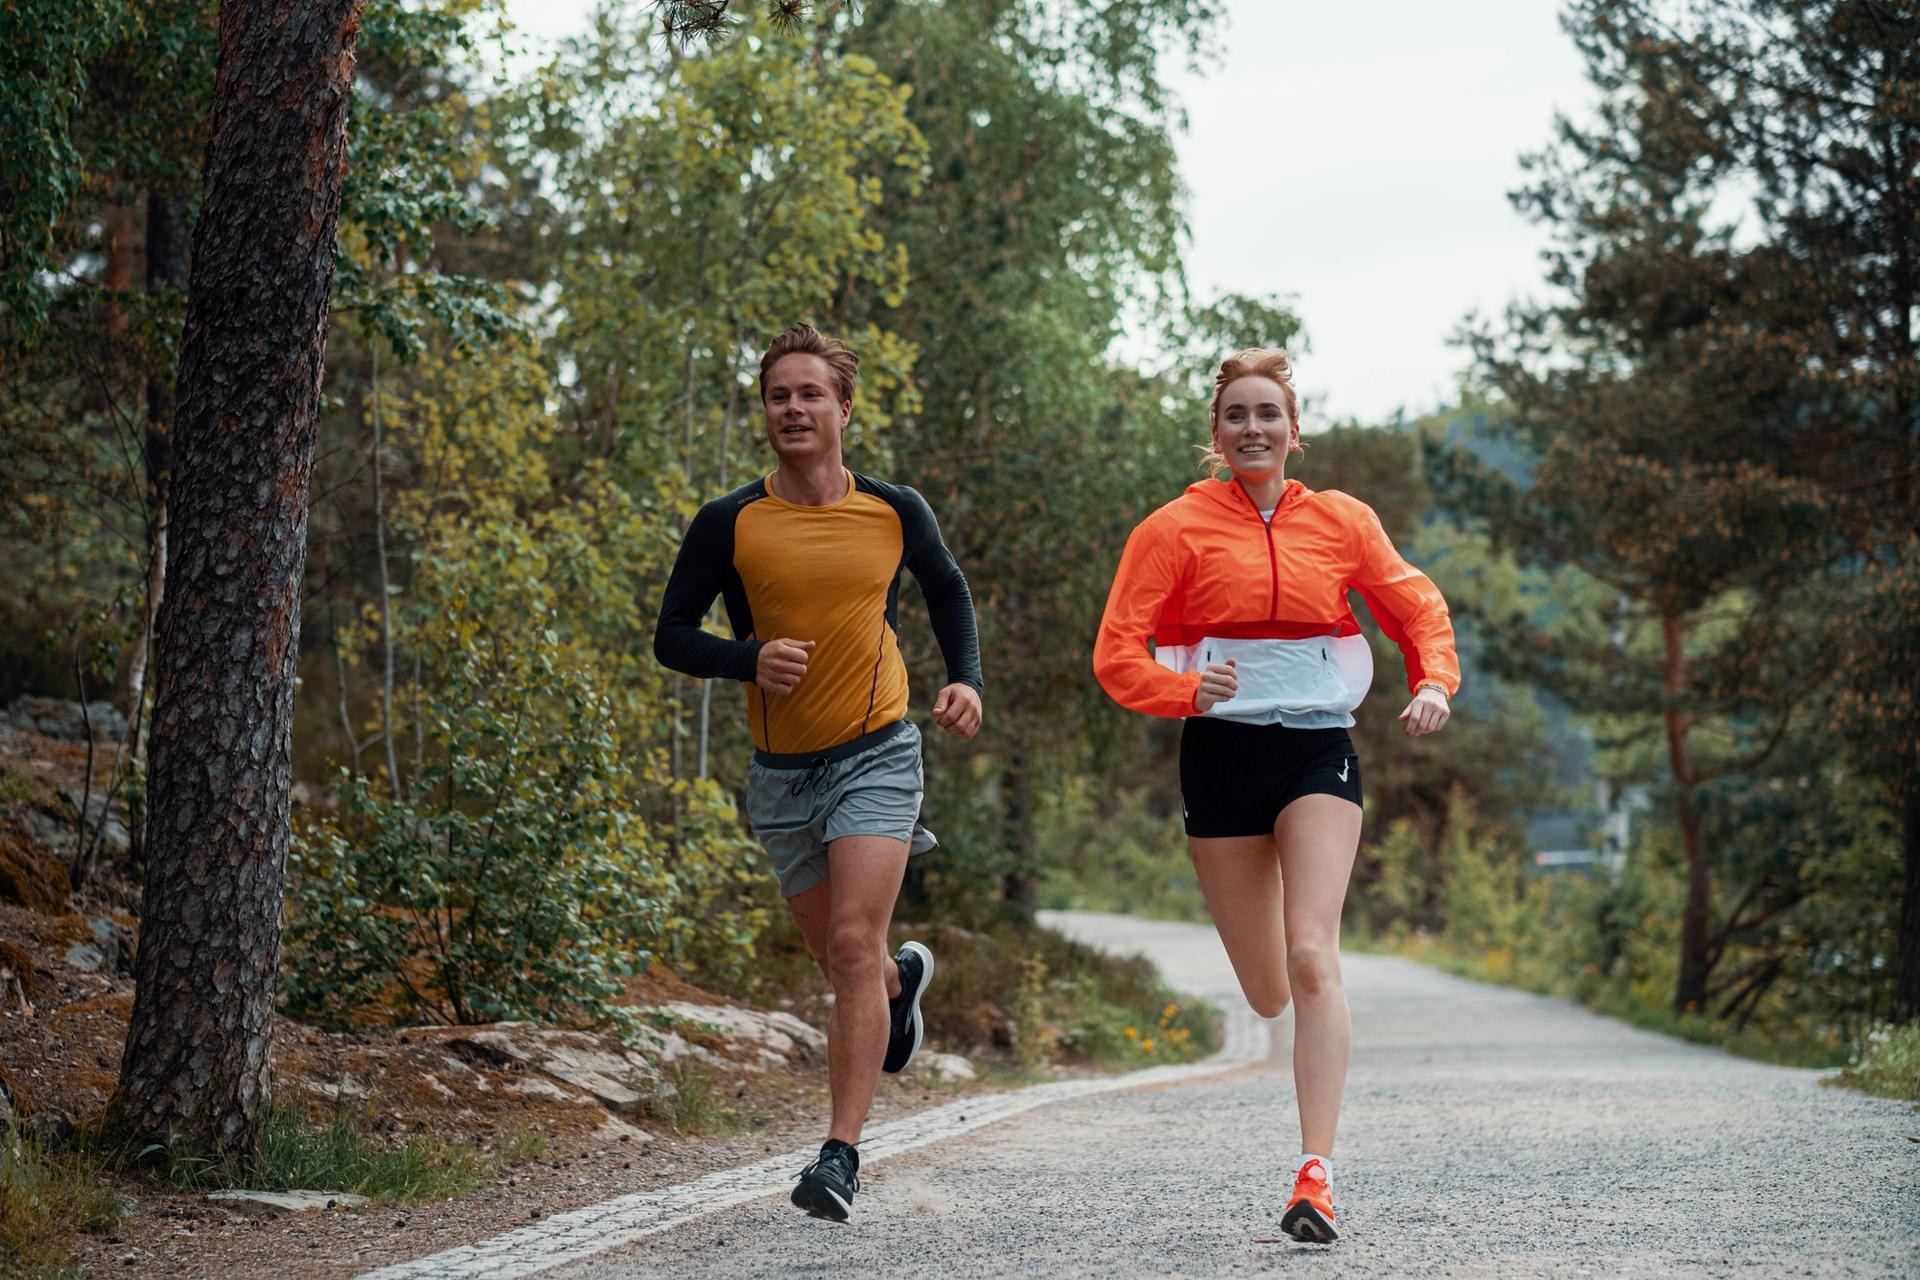 Ung mann og dame løper på grussti